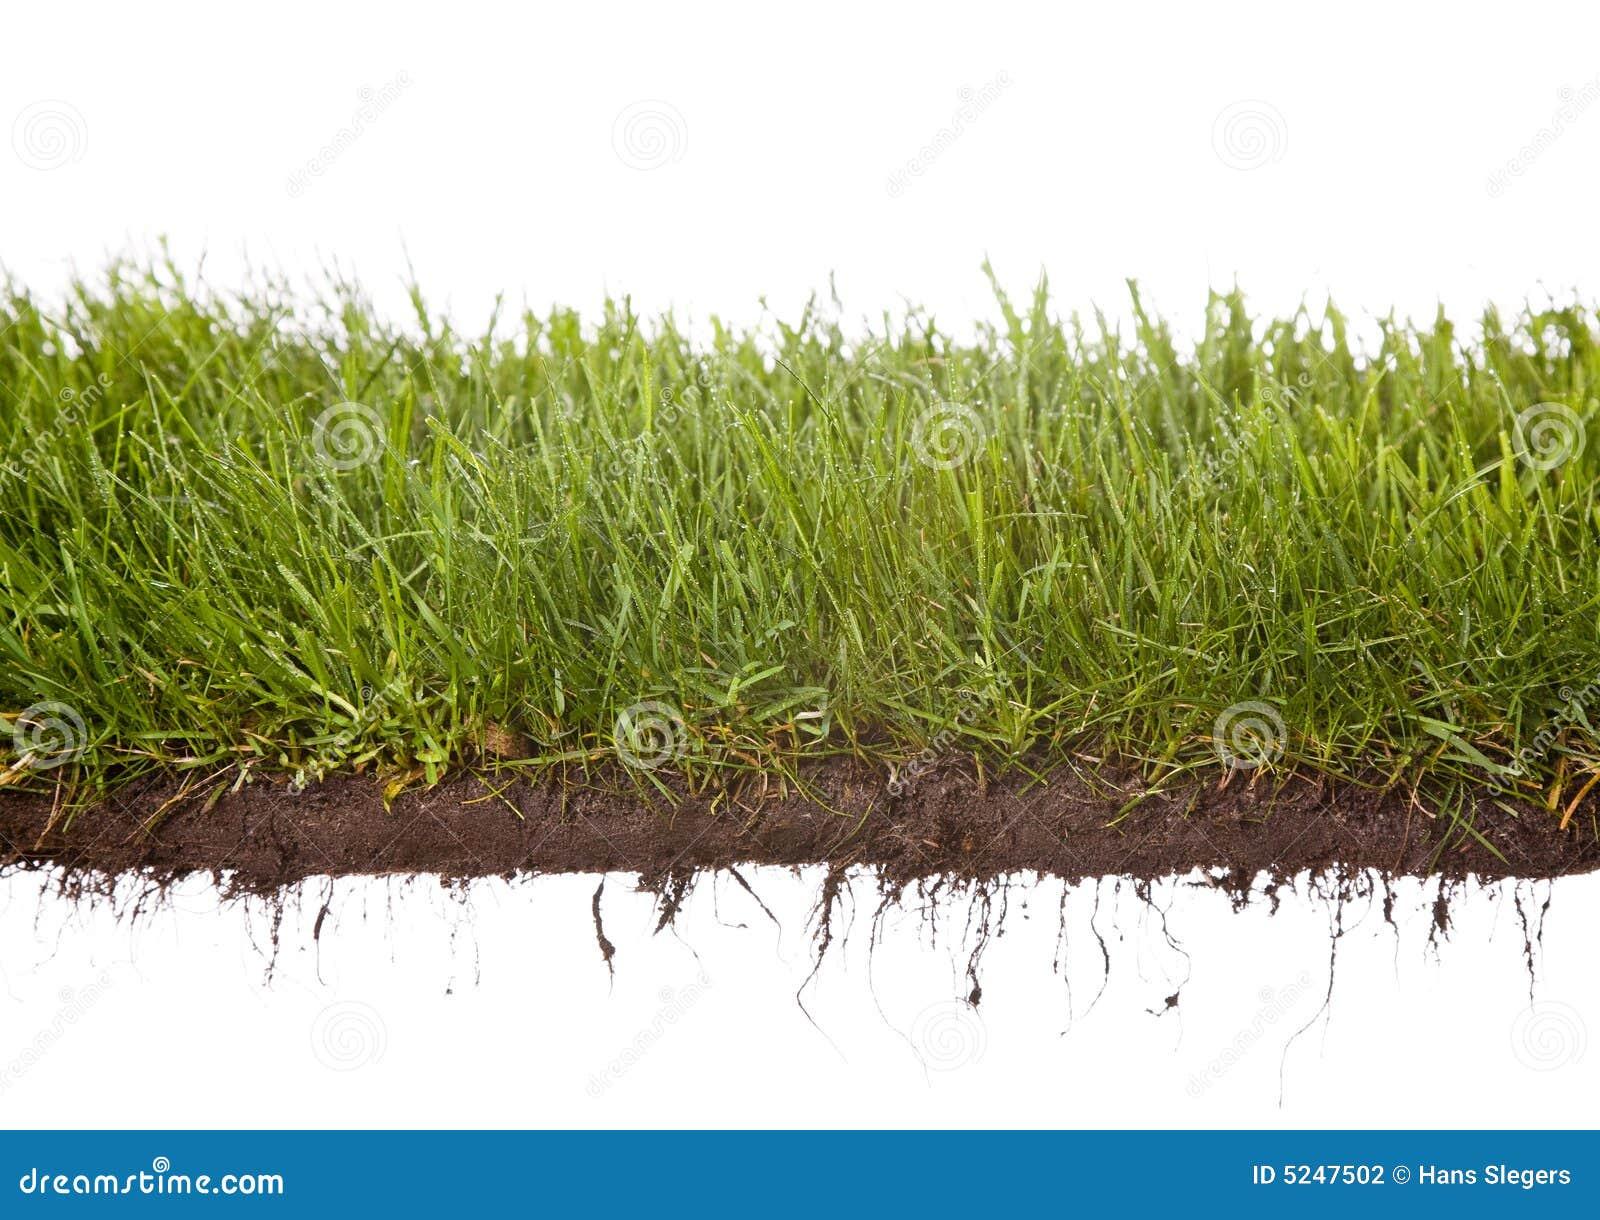 Grass dewdrops